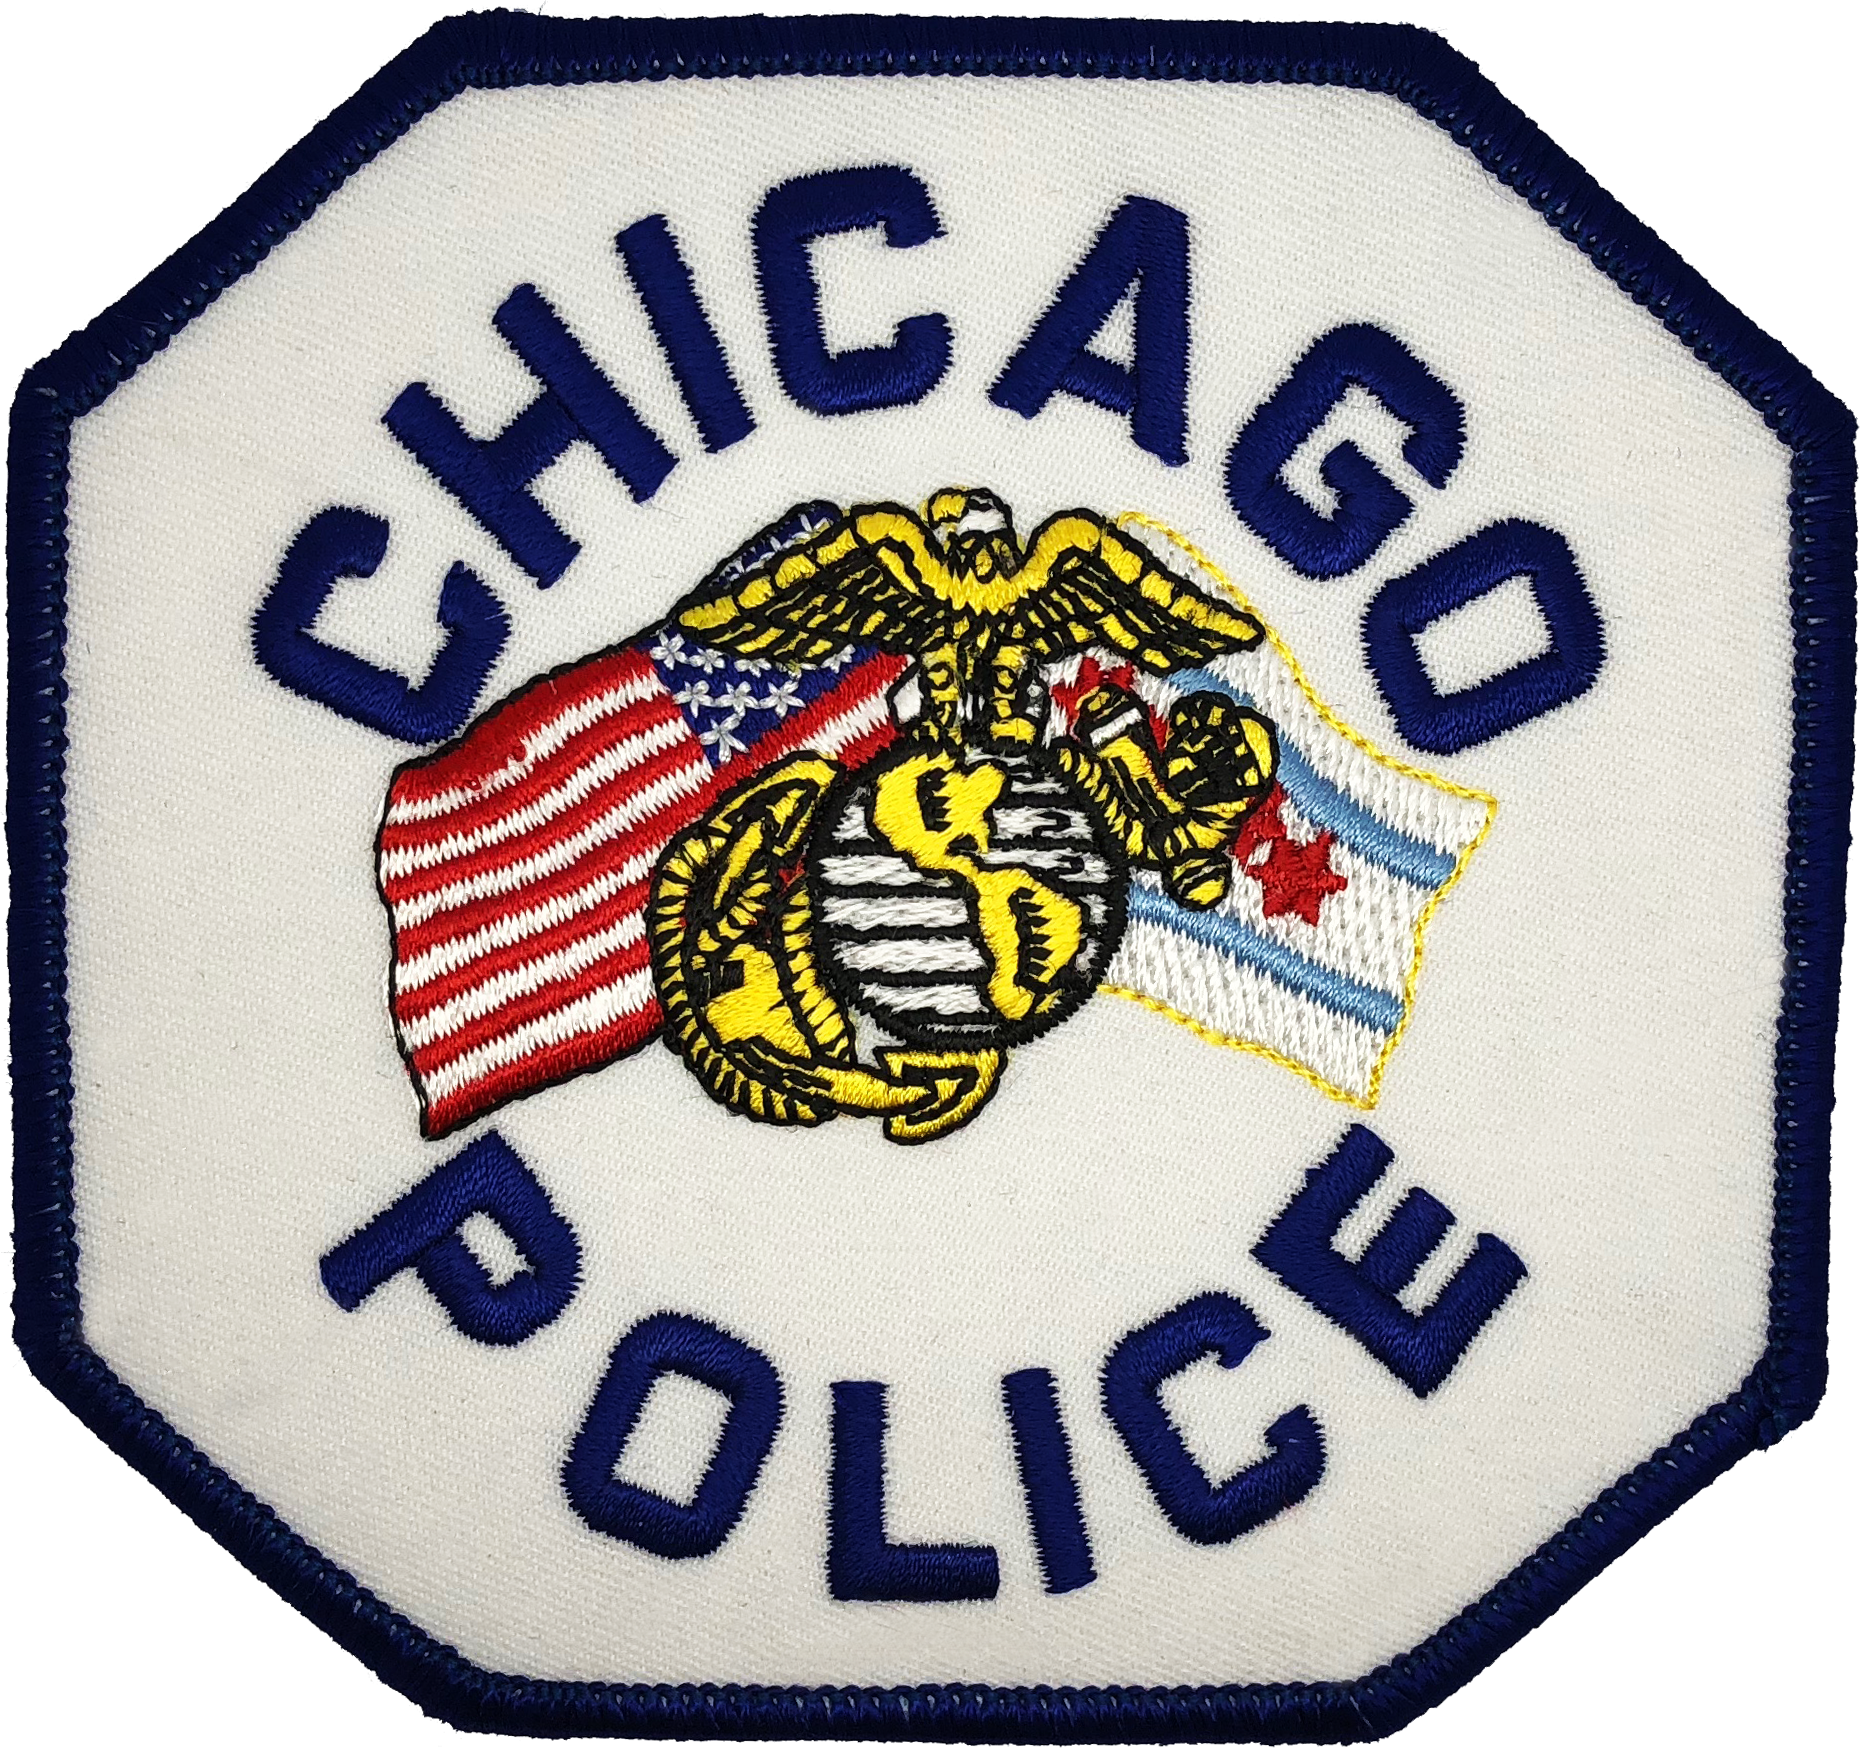 7dd6a65046c CHICAGO POLICE SHOULDER PATCH  U.S. Marine Corps